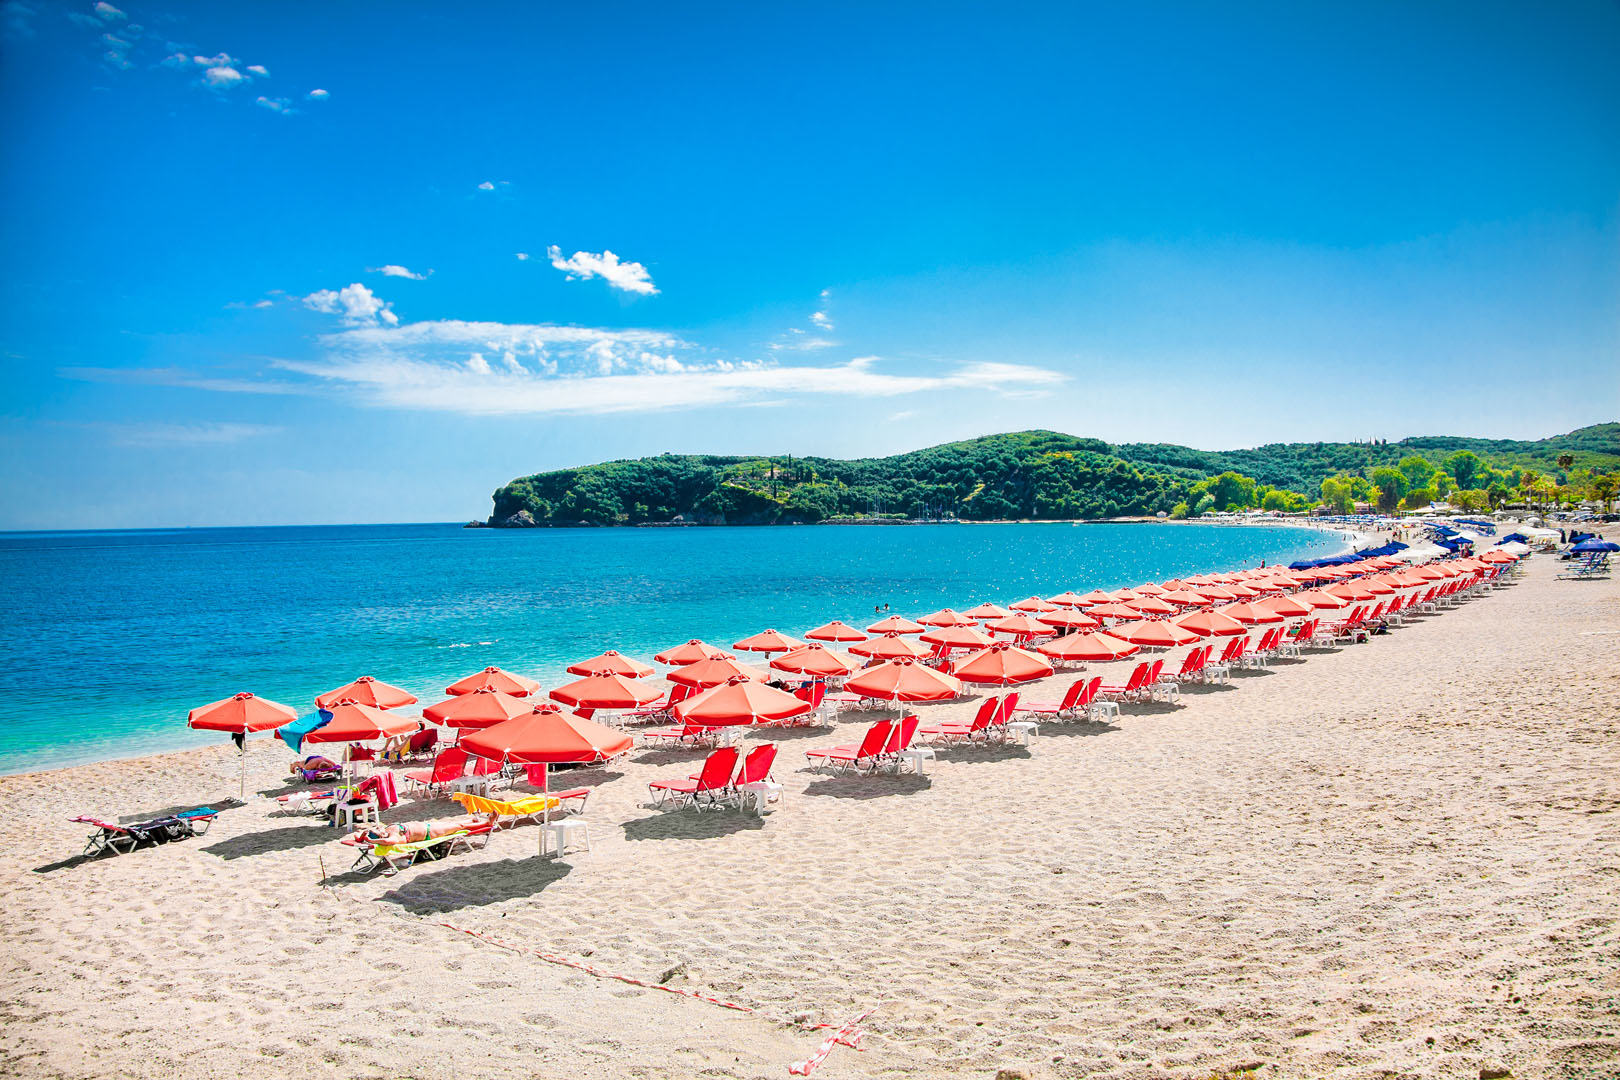 Valtos-Beach-walking-path-with-Ionian-Cruises